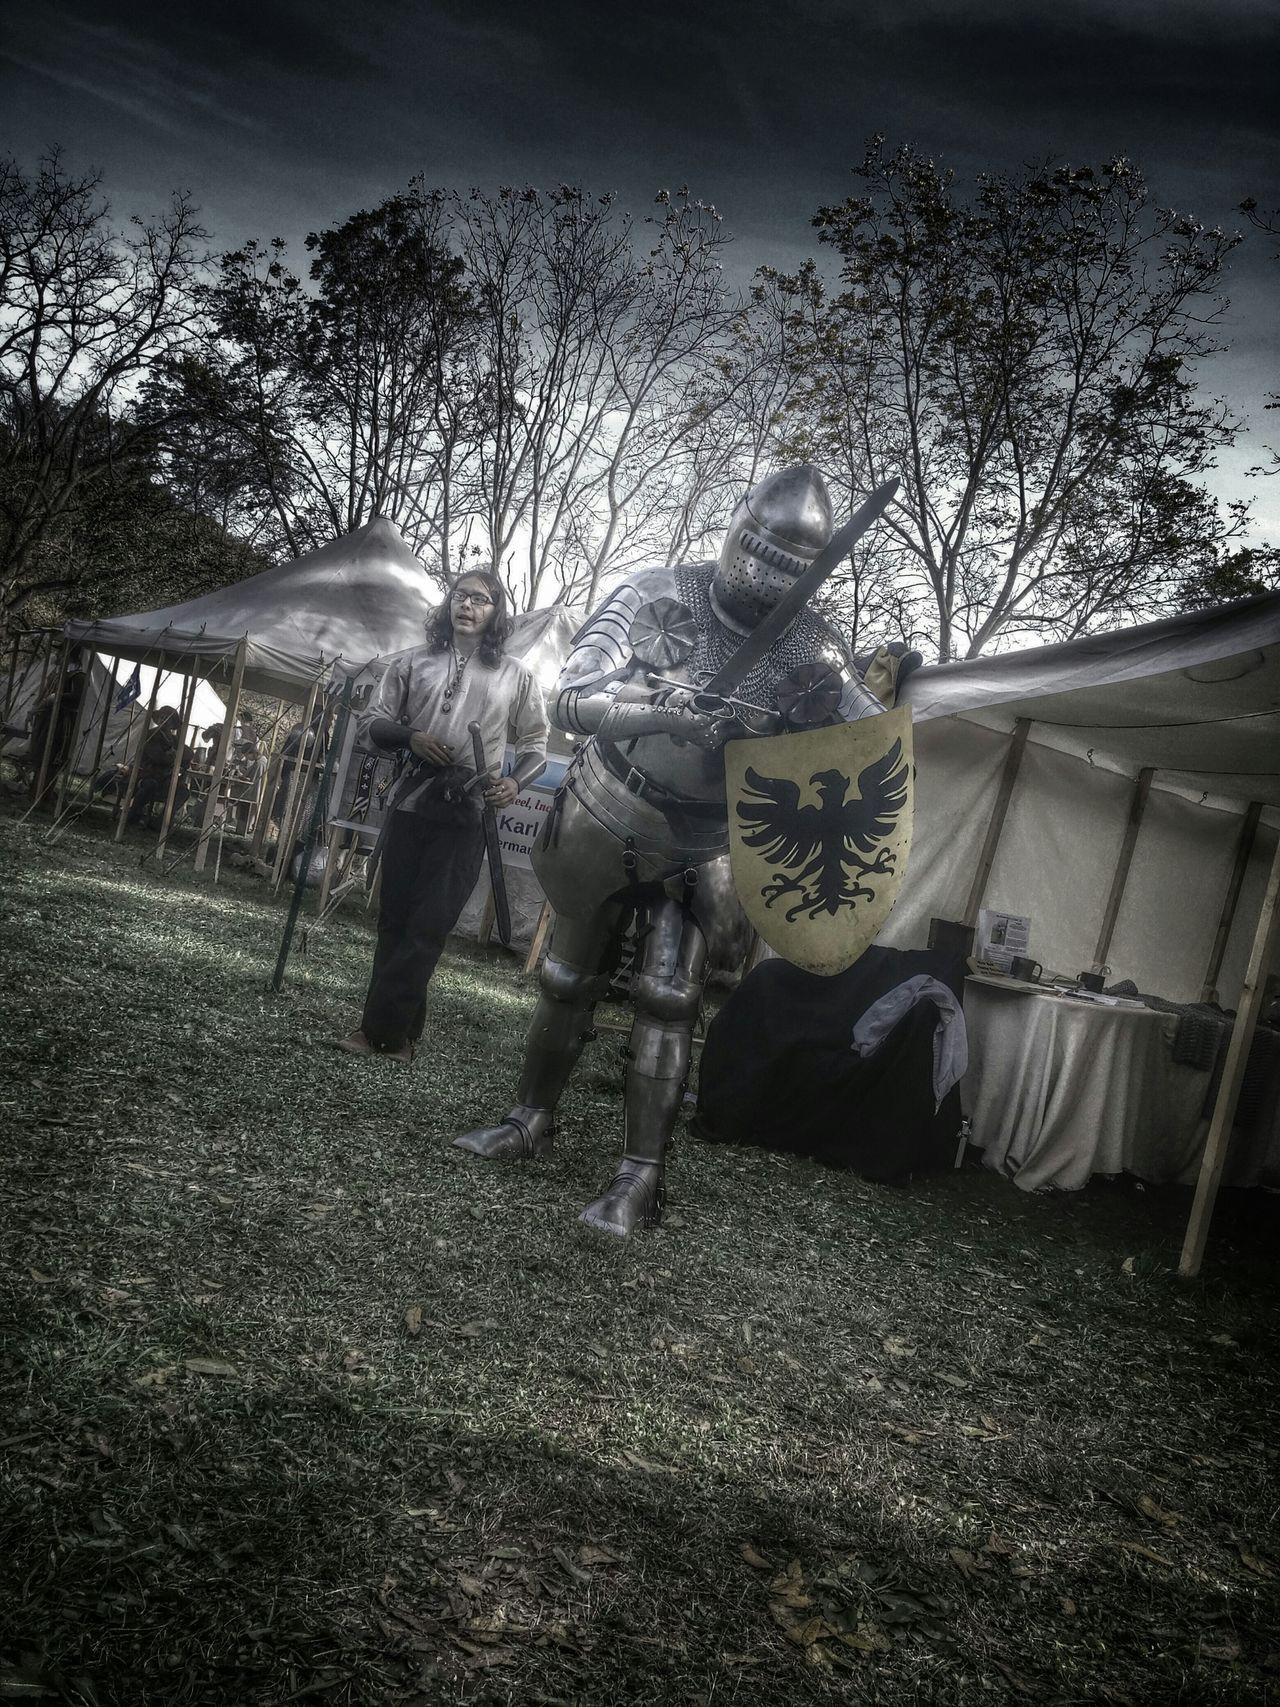 Rennissance Festival Newglarus Wisconsin Knight  Armor Squire Awesome Likeit Follow4follow Commentbelow